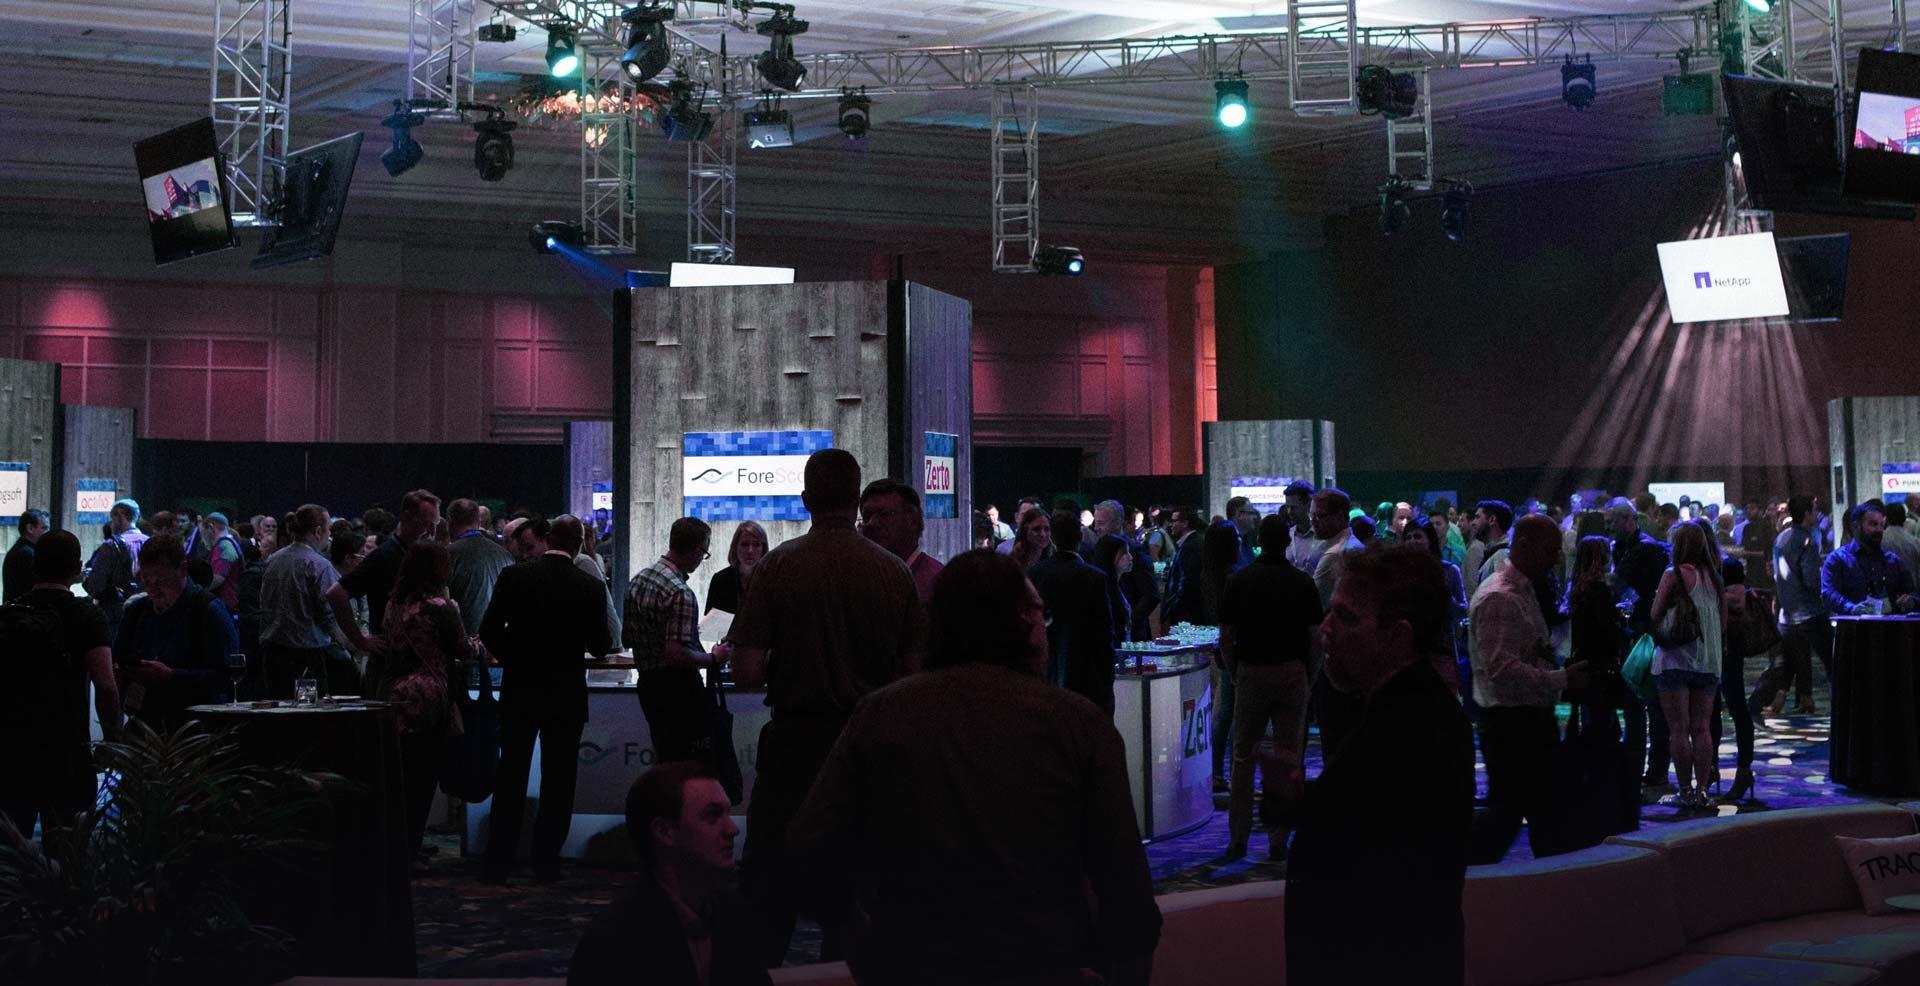 Large-Conference-Exhibit-Hotel-Ballroom.jpg